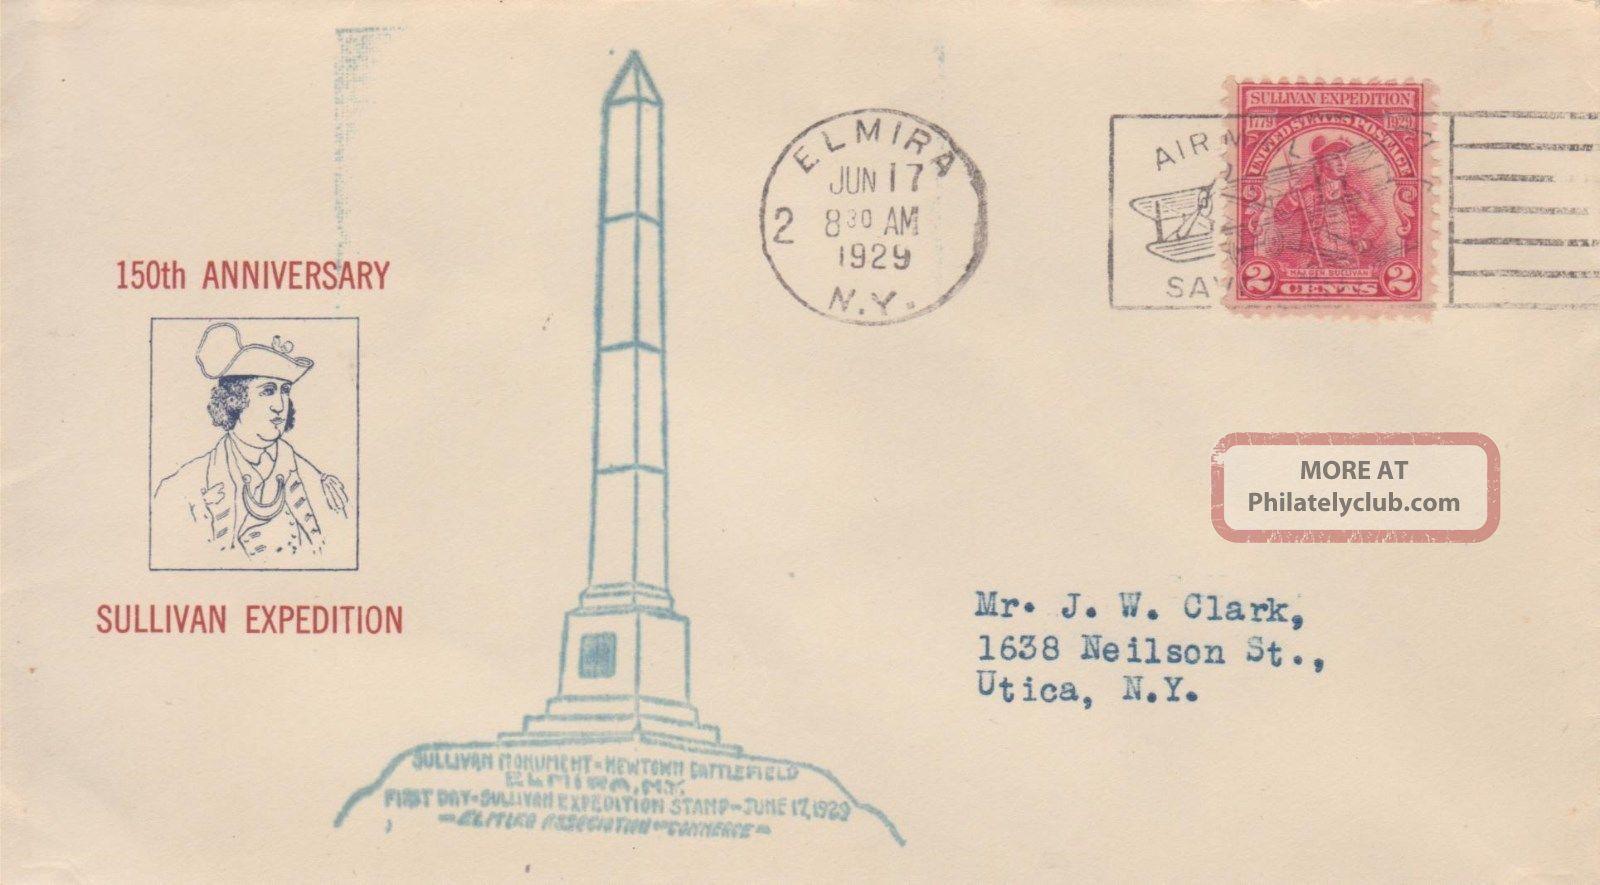 657 - 9var (addl 647 - 4 Rs Cachet) 2c Sullivan Pm Elmira Ny 6/17/29,  S,  Mauck FDCs (pre-1951) photo